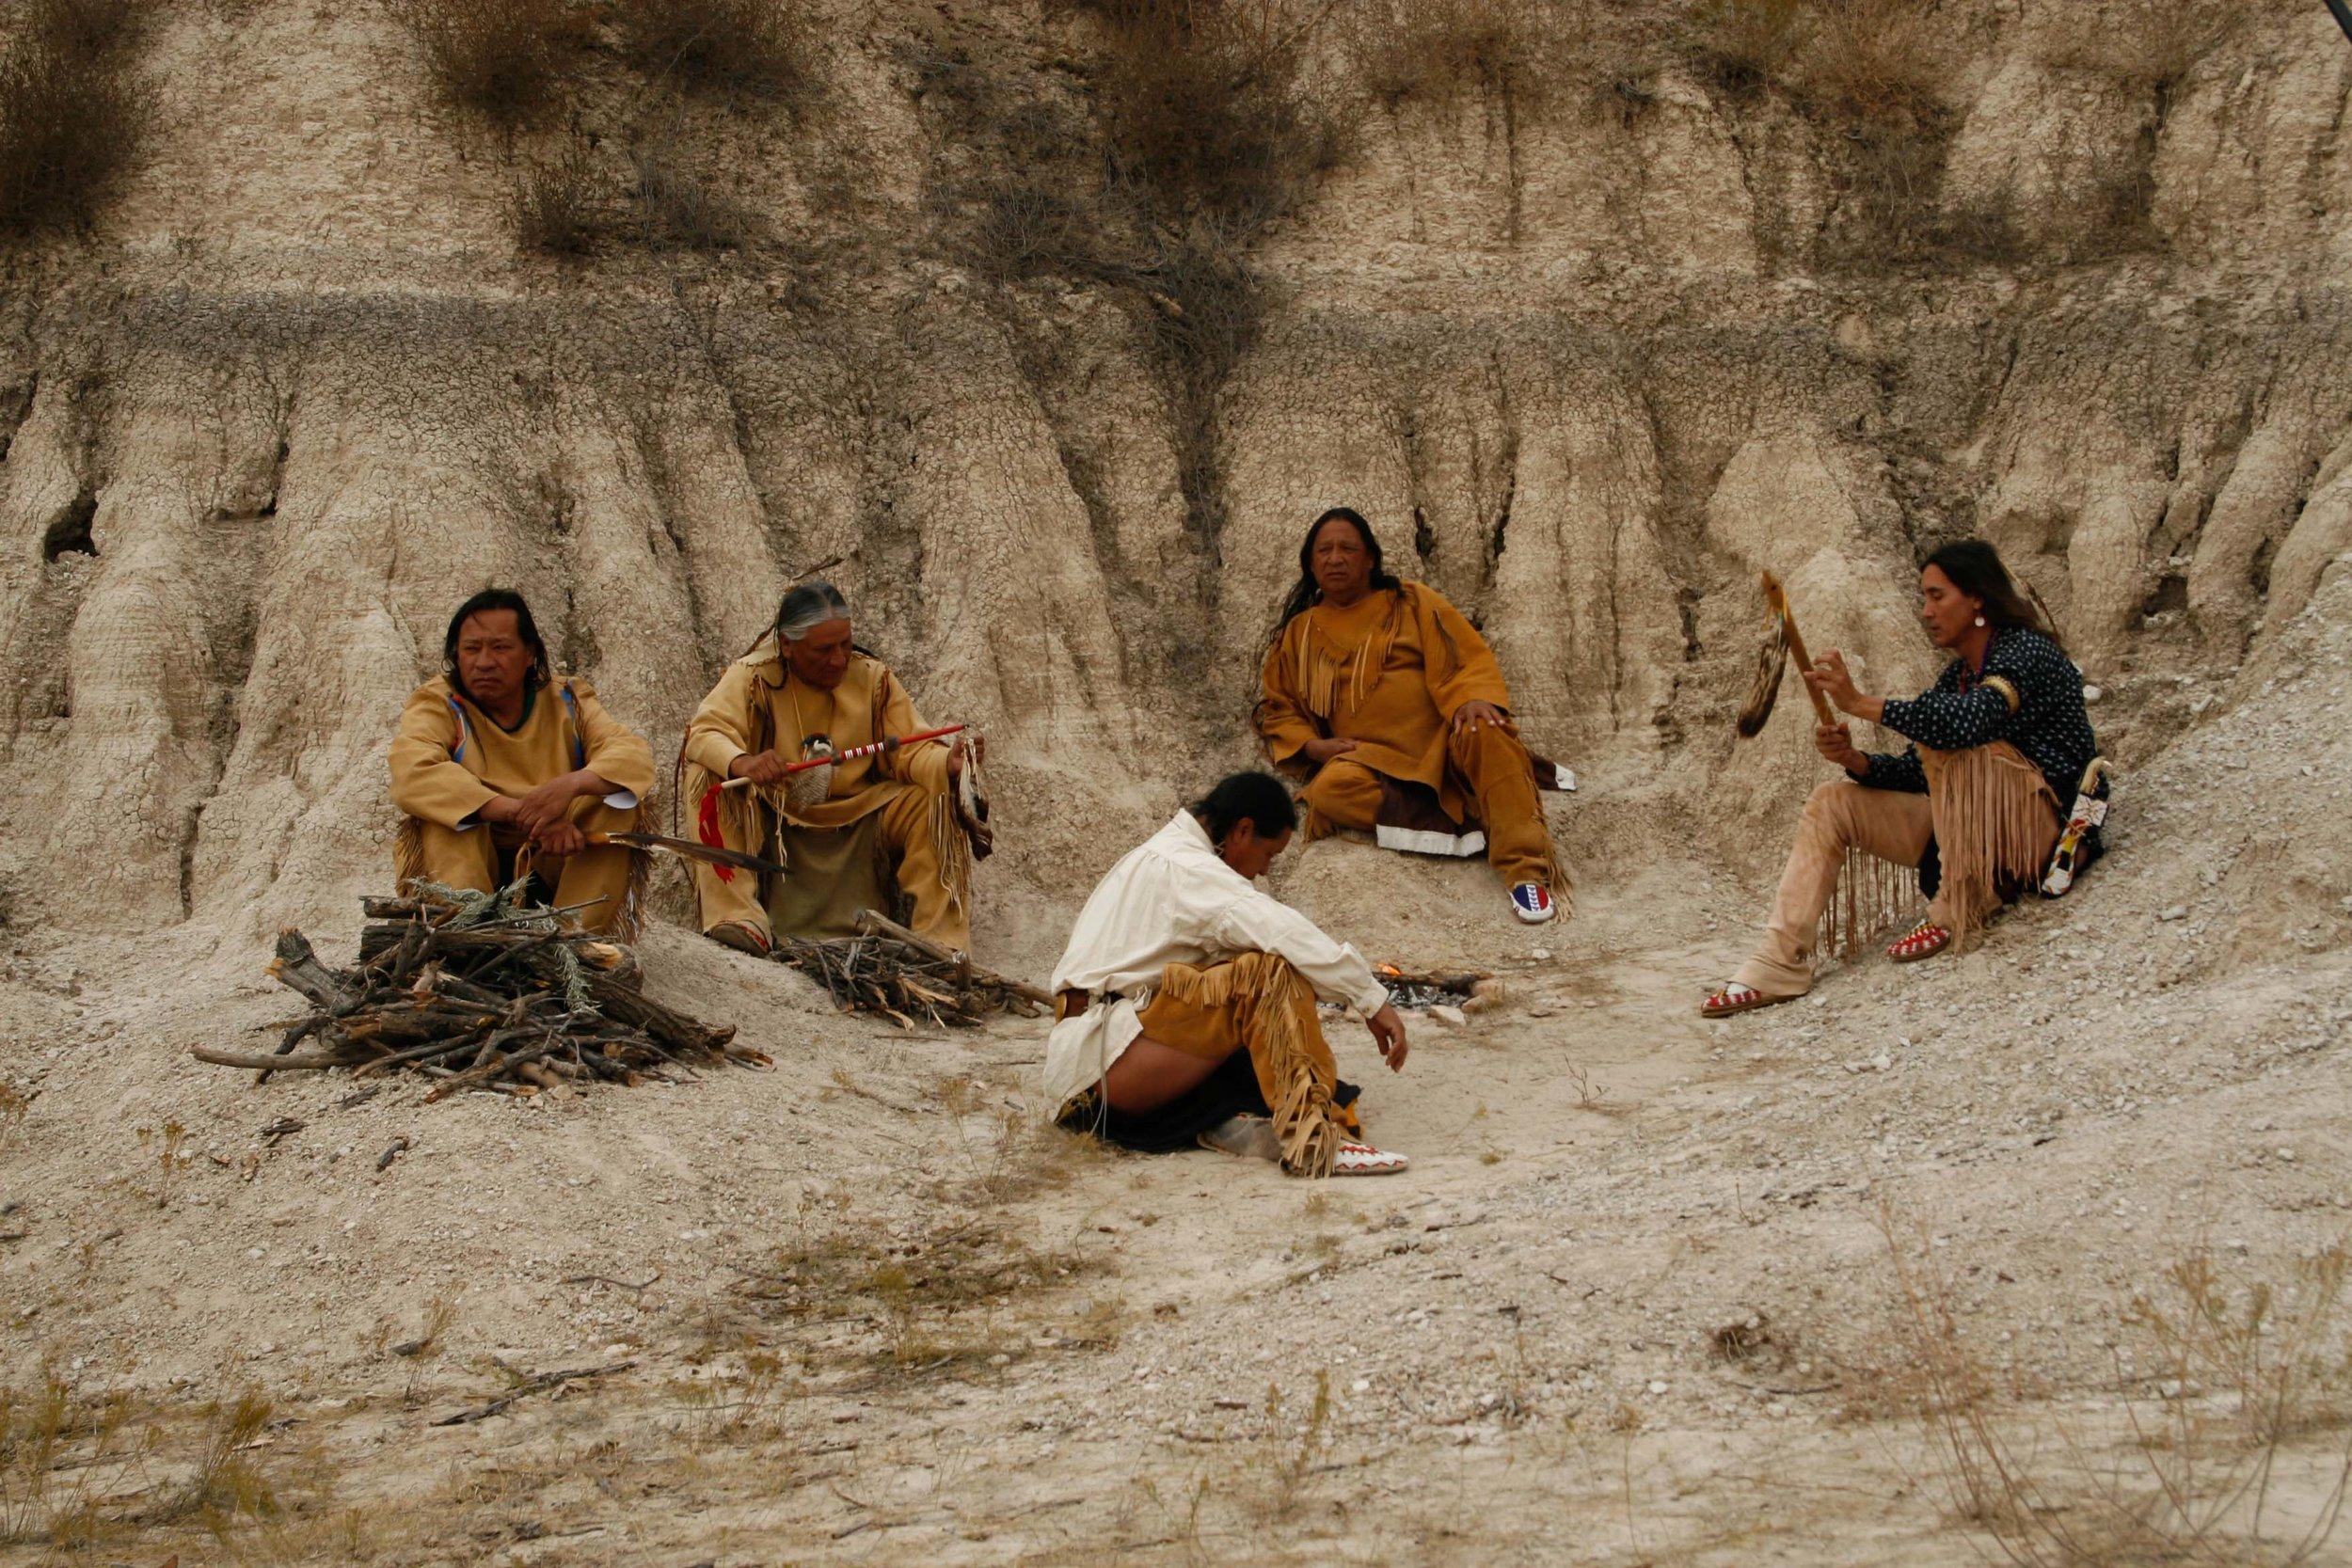 ben-red-bear-indian-elder-corbin-conroy-little-thunder-larry-swalley-minor-running-cloud-albert-red-bear-red-wolf-steve-garcia-charlie-littlefeather-campfire-scene.jpg